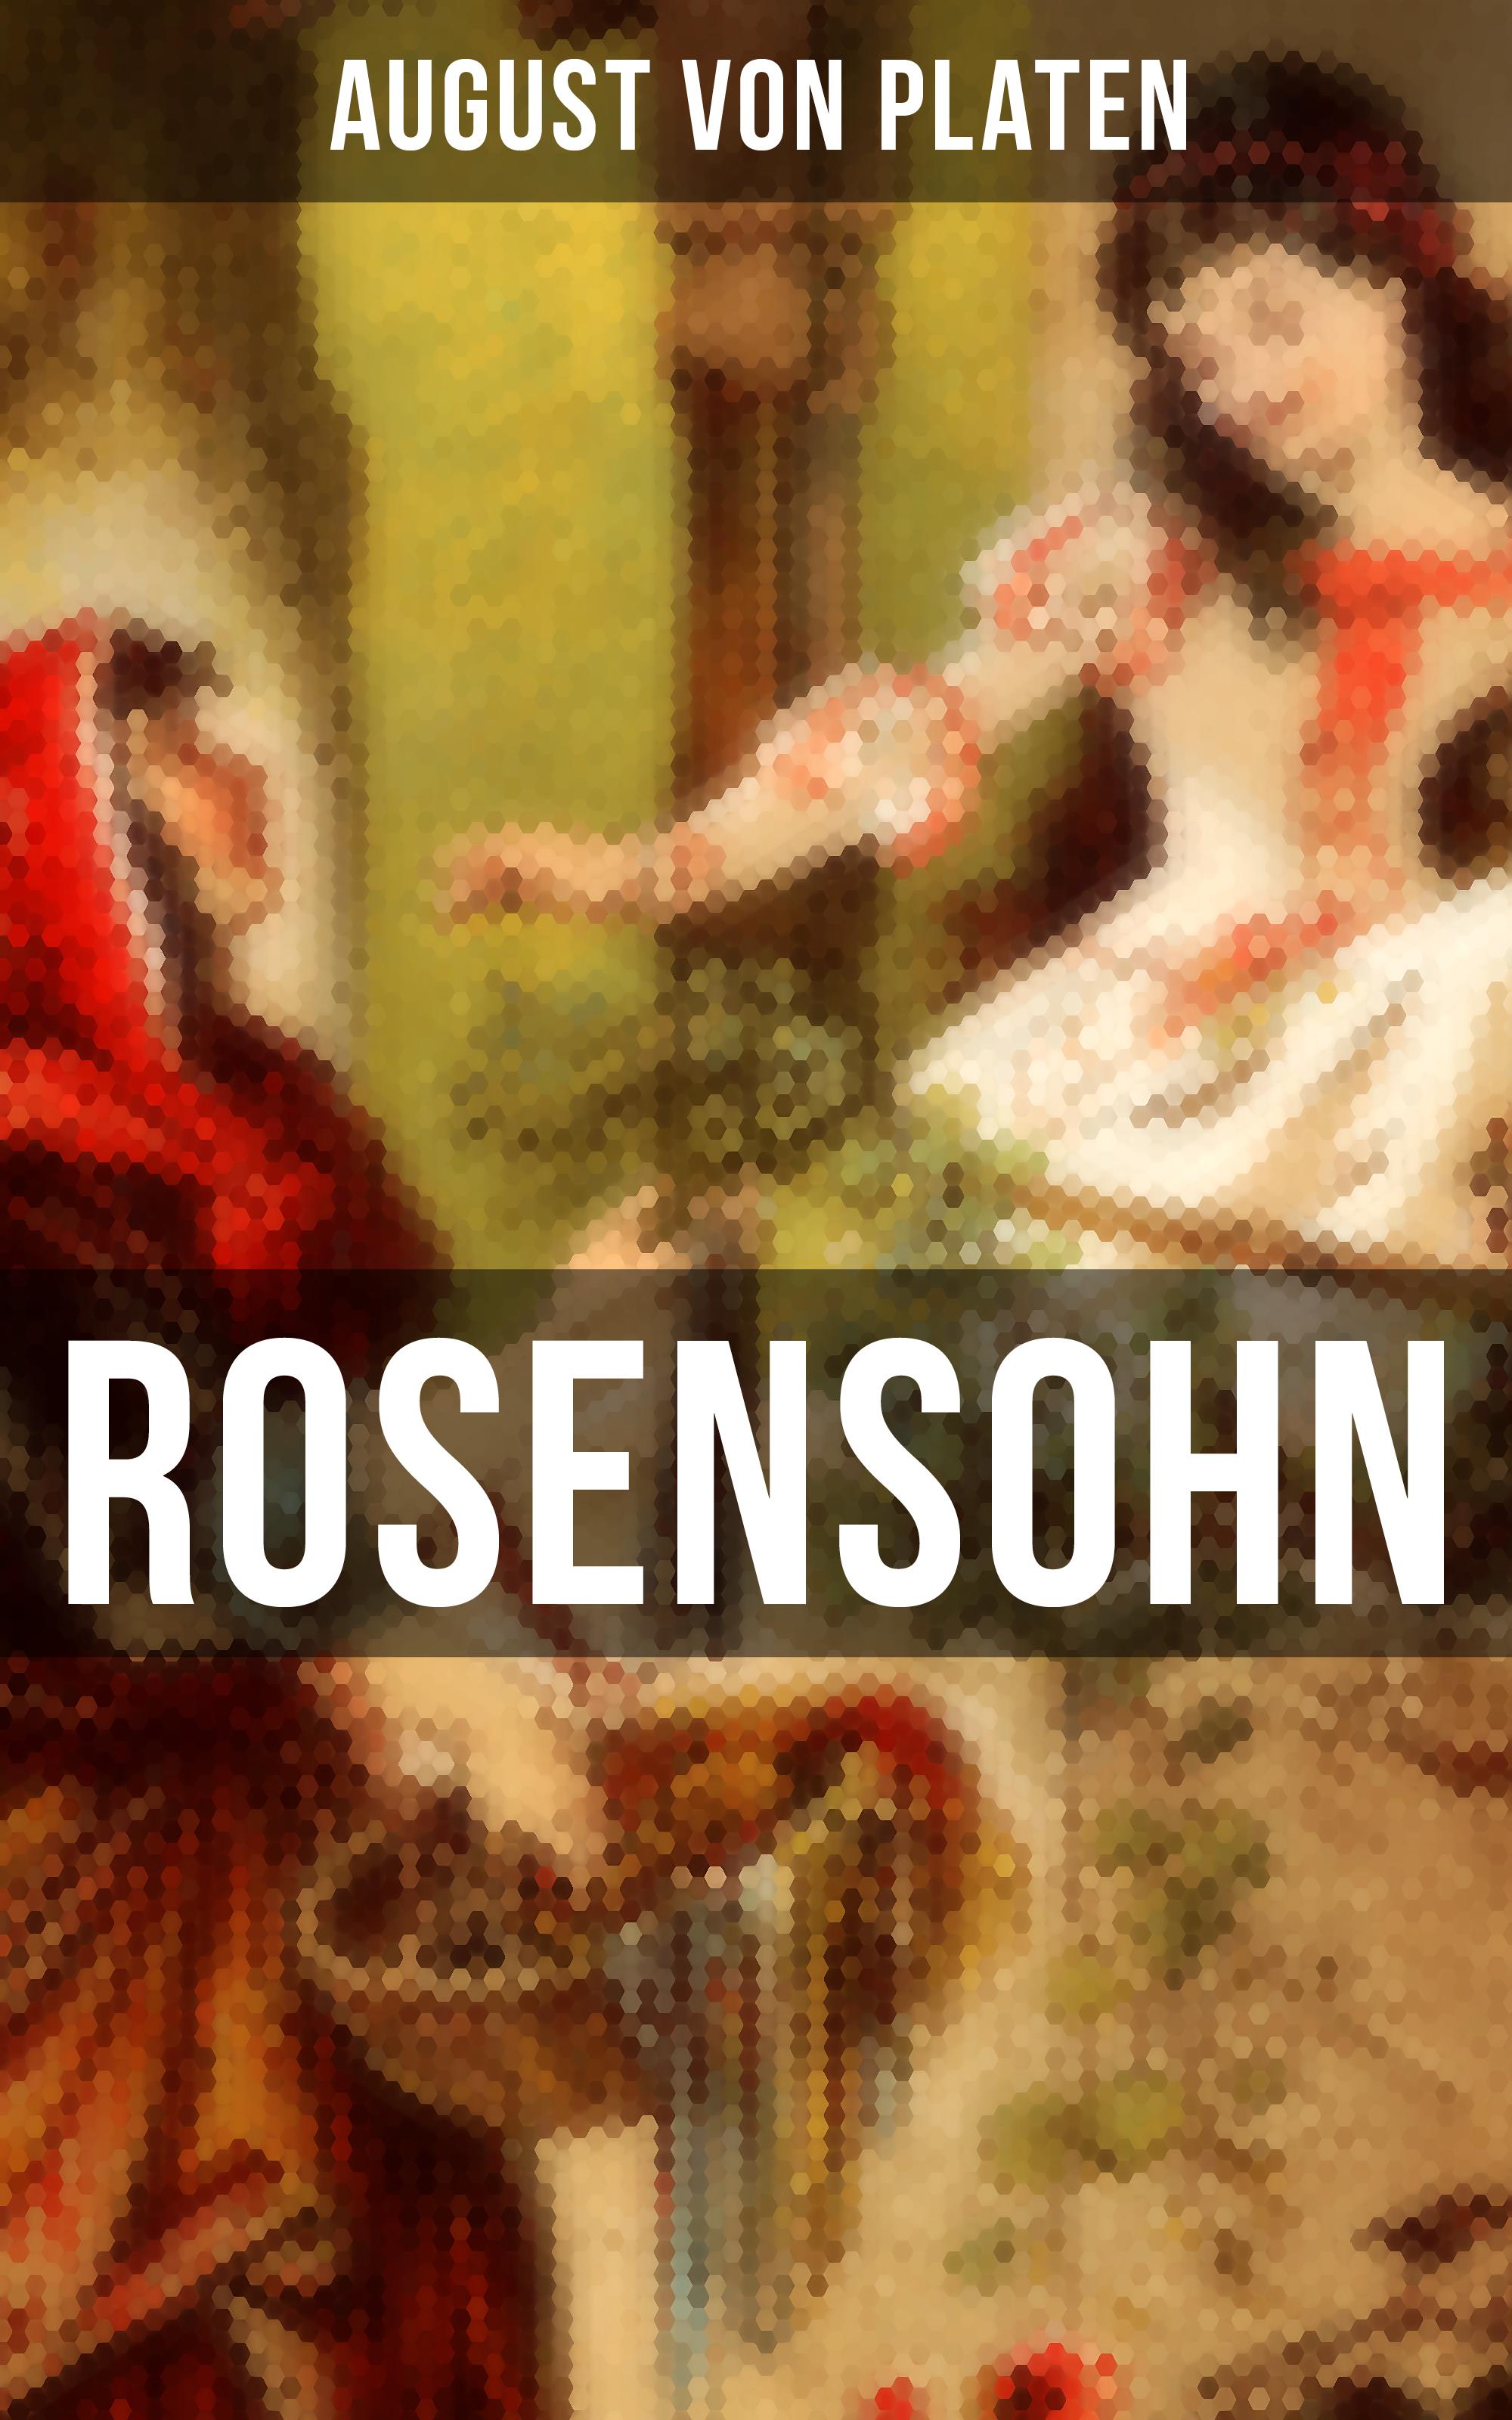 August von Platen ROSENSOHN